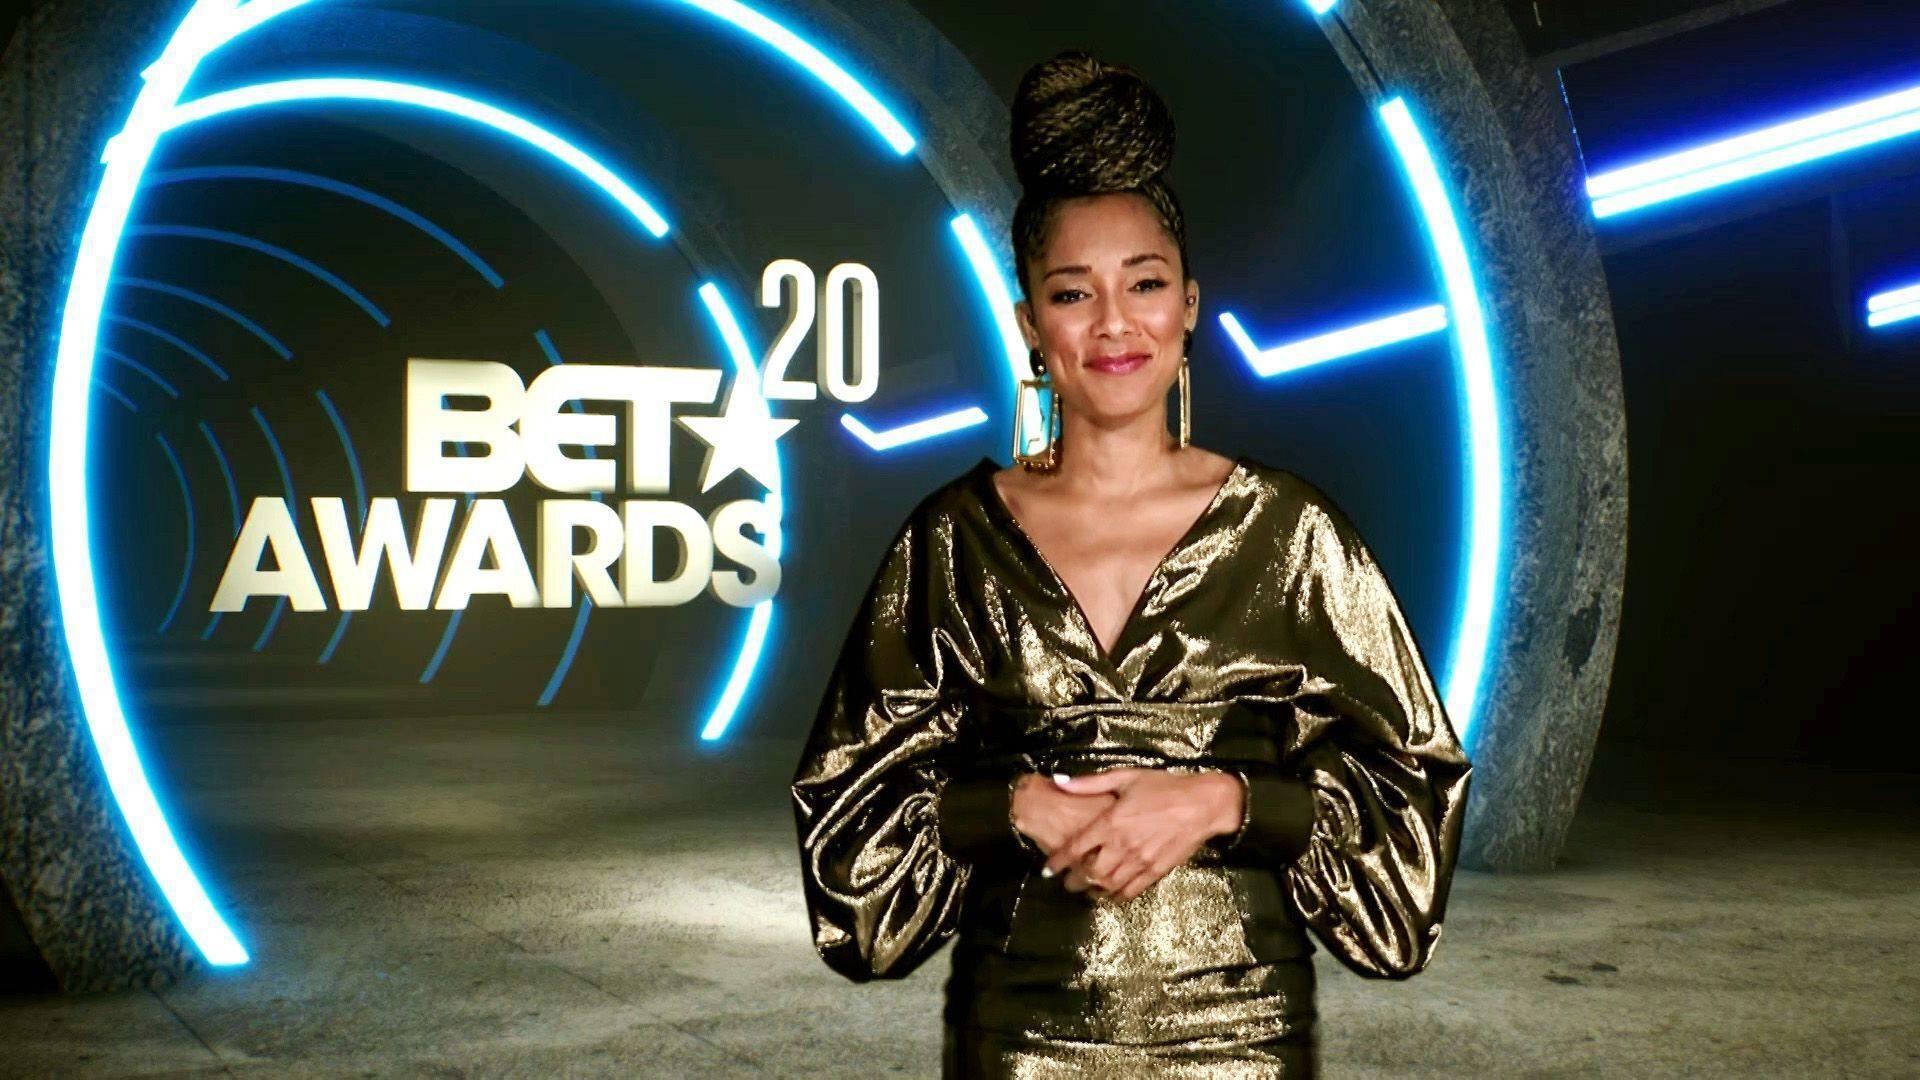 BET Awards 2020 | Host Looks Gallery 12 | 1920x1080